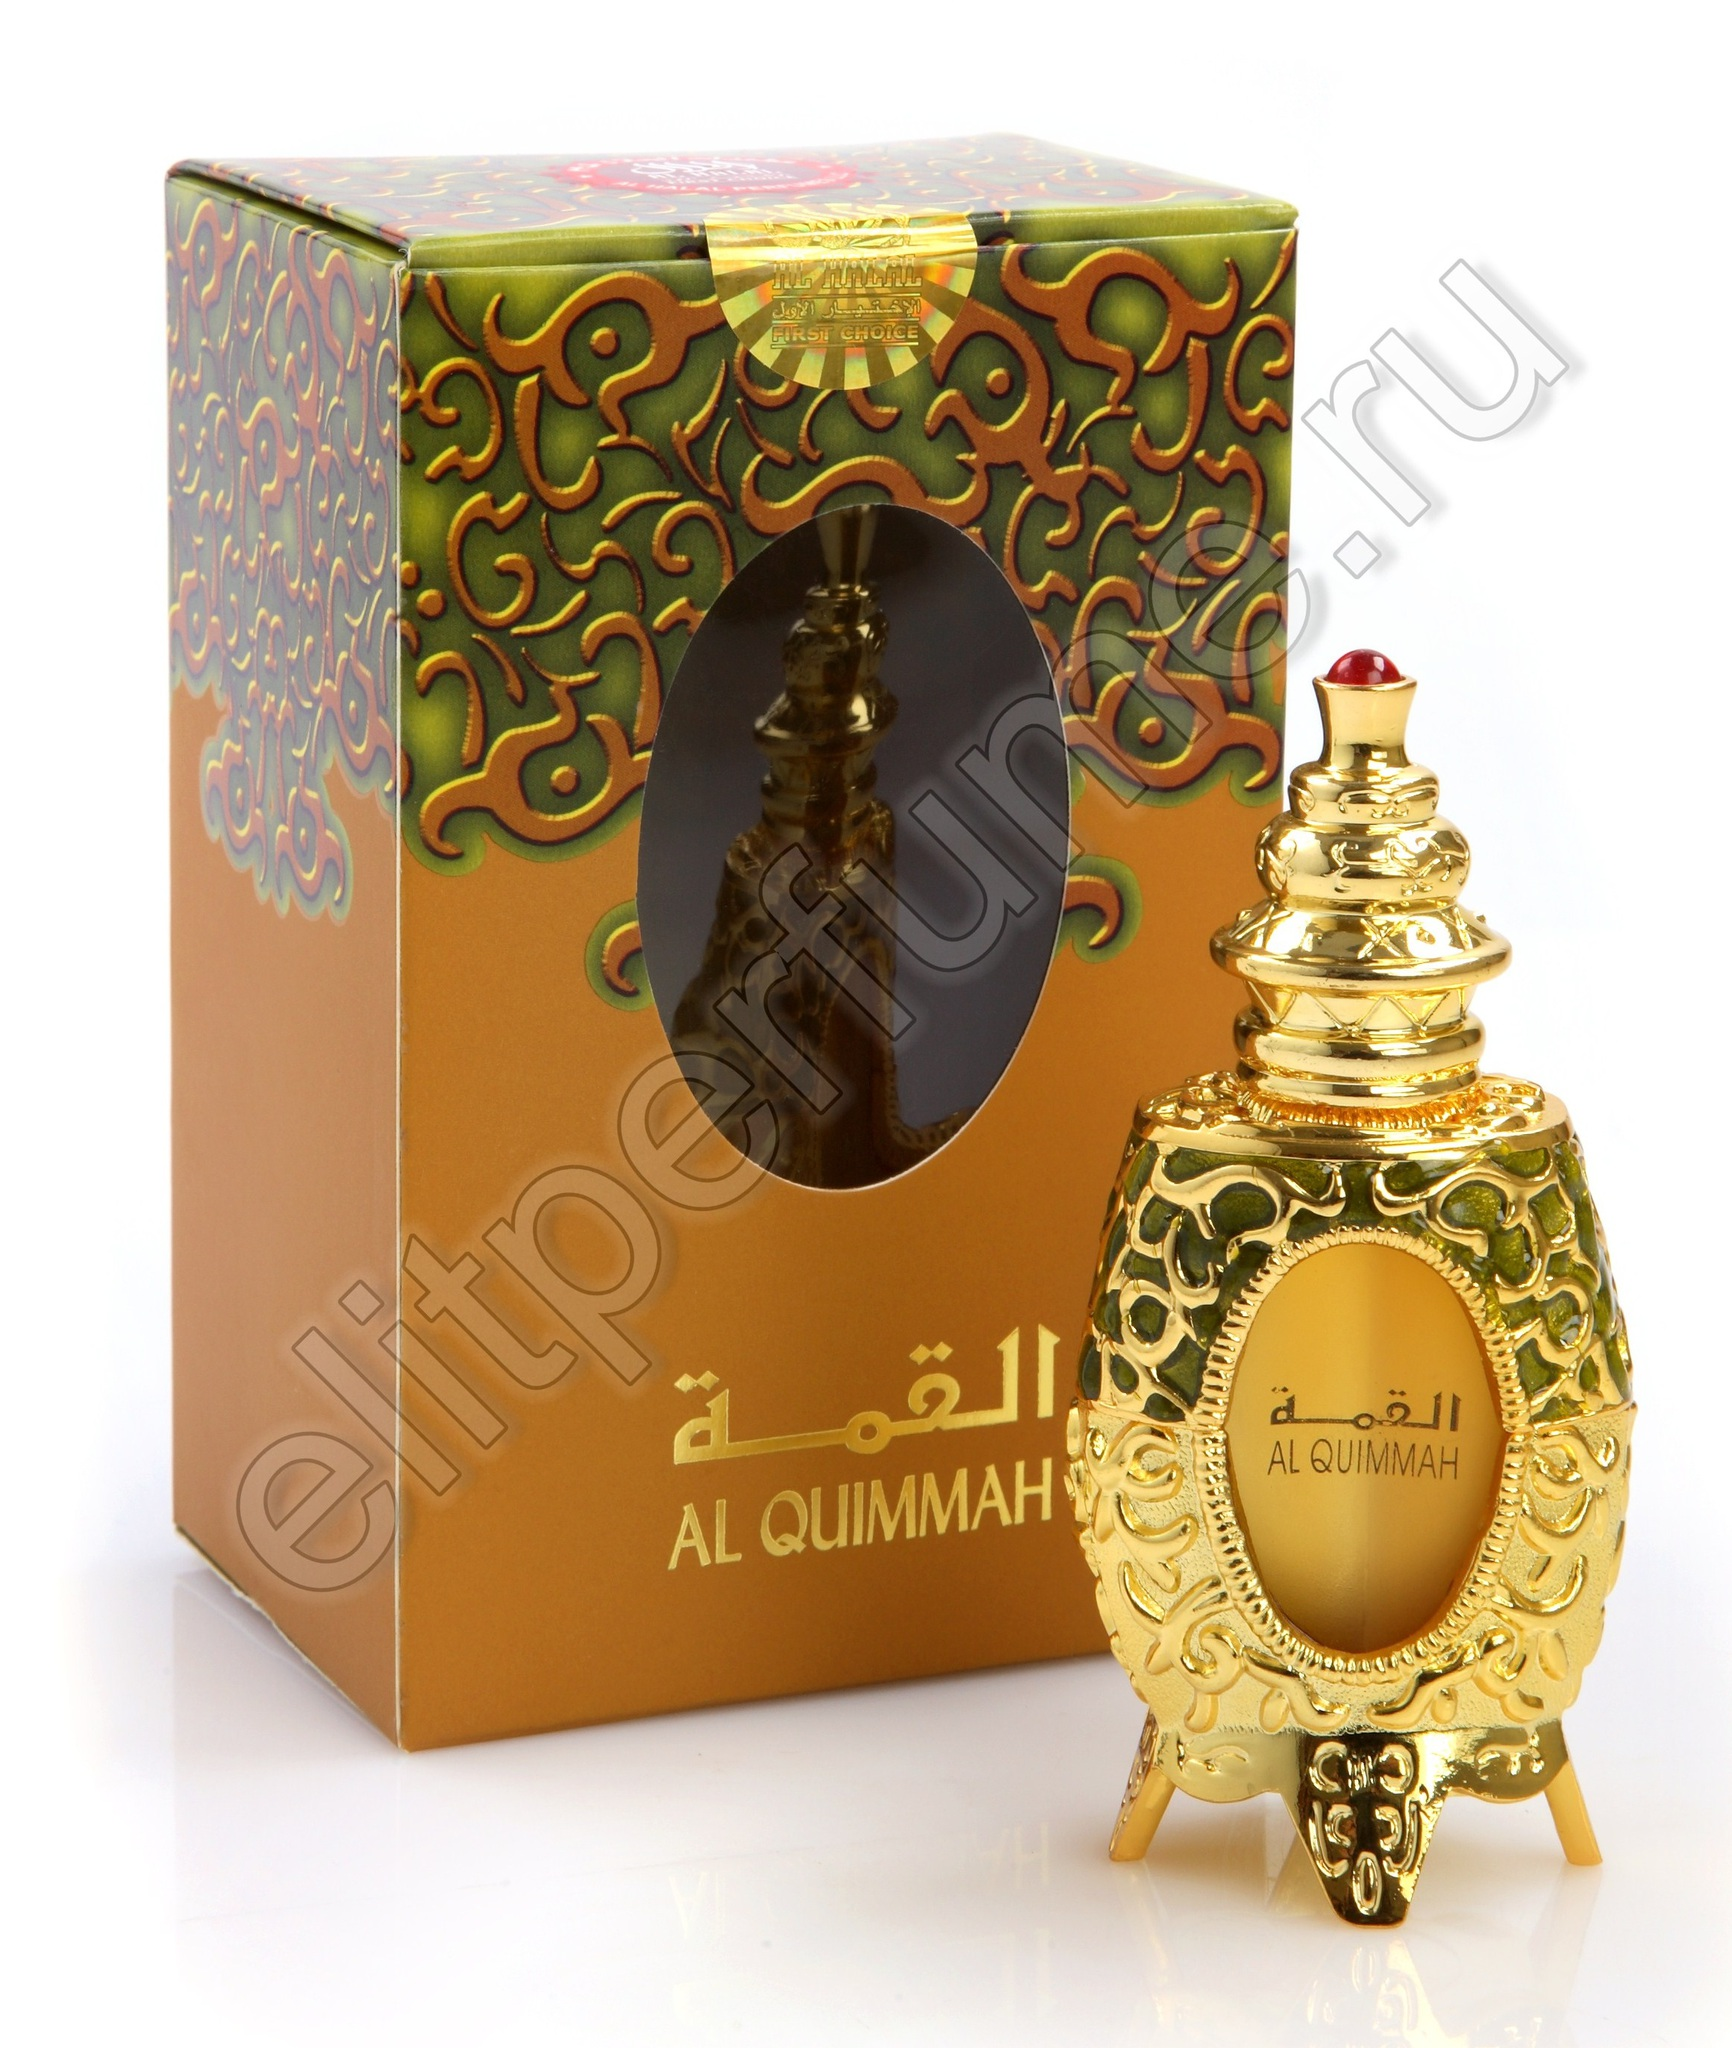 Аль-Кимма Al Quimmah 12 мл арабские масляные духи от Аль Харамайн Al Haramain Perfumes